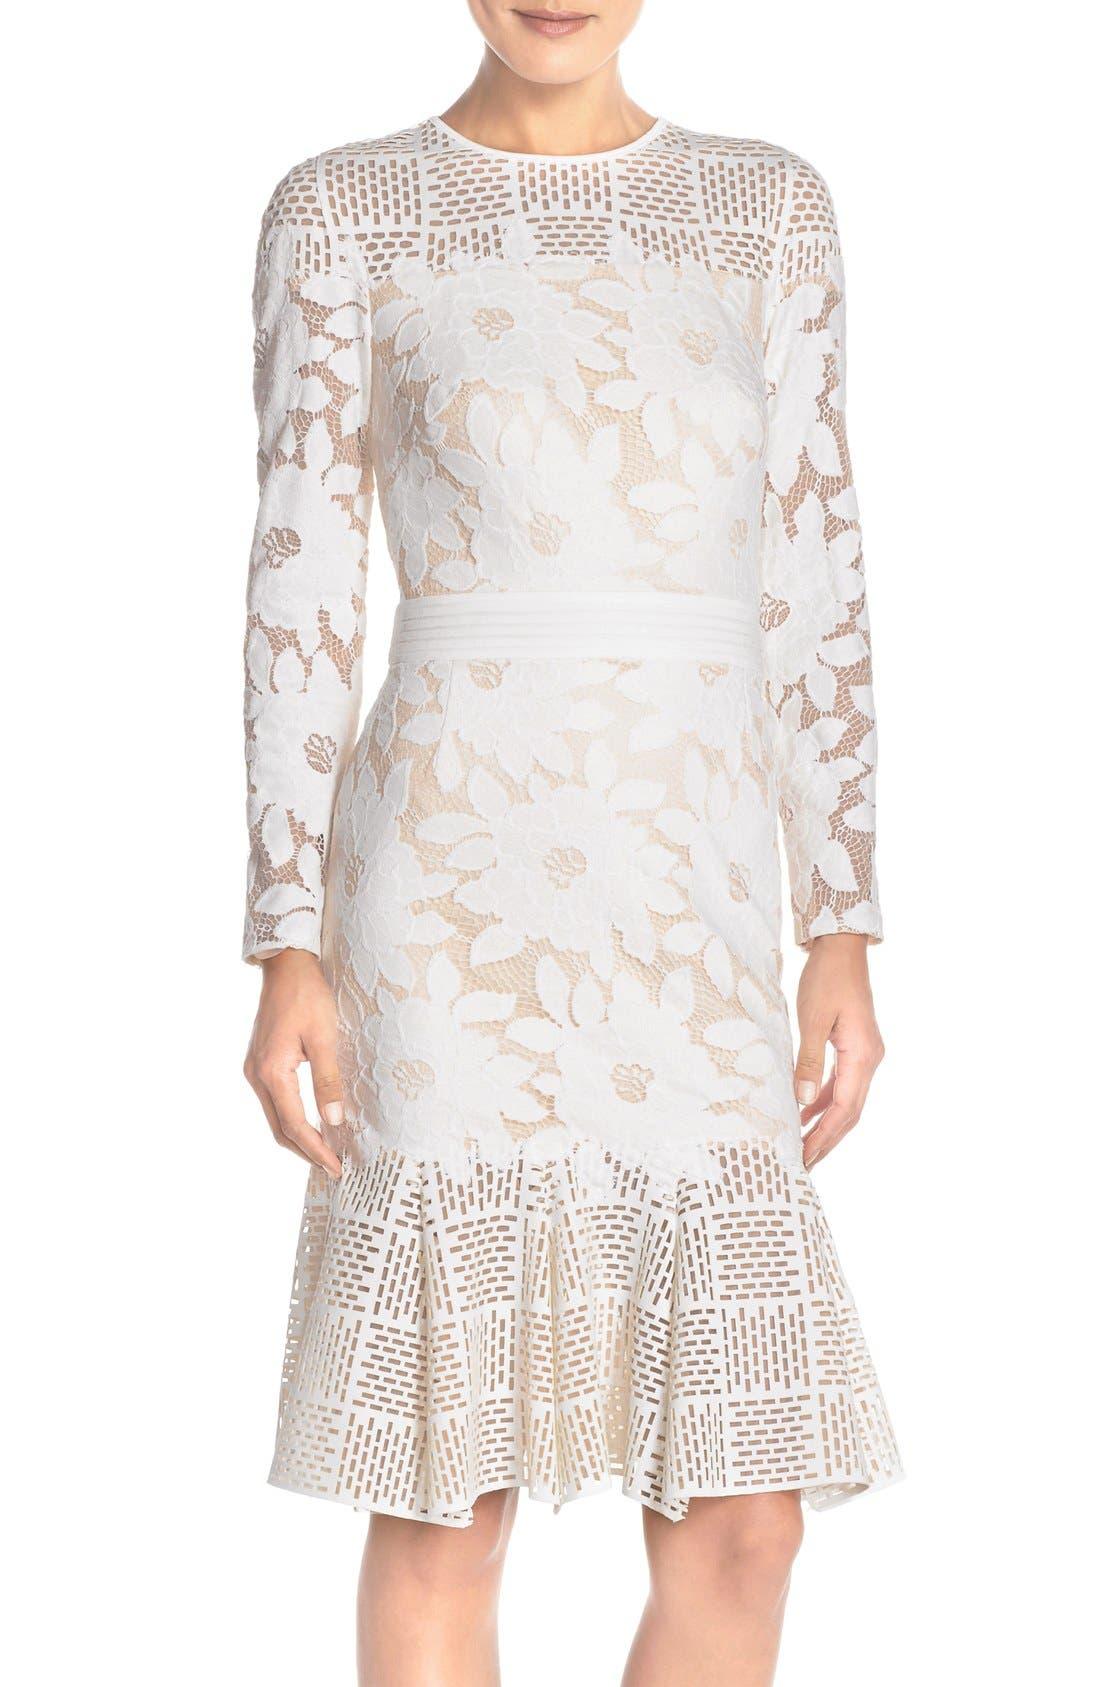 Lace & Cutout Neoprene Sheath Dress,                             Main thumbnail 1, color,                             904